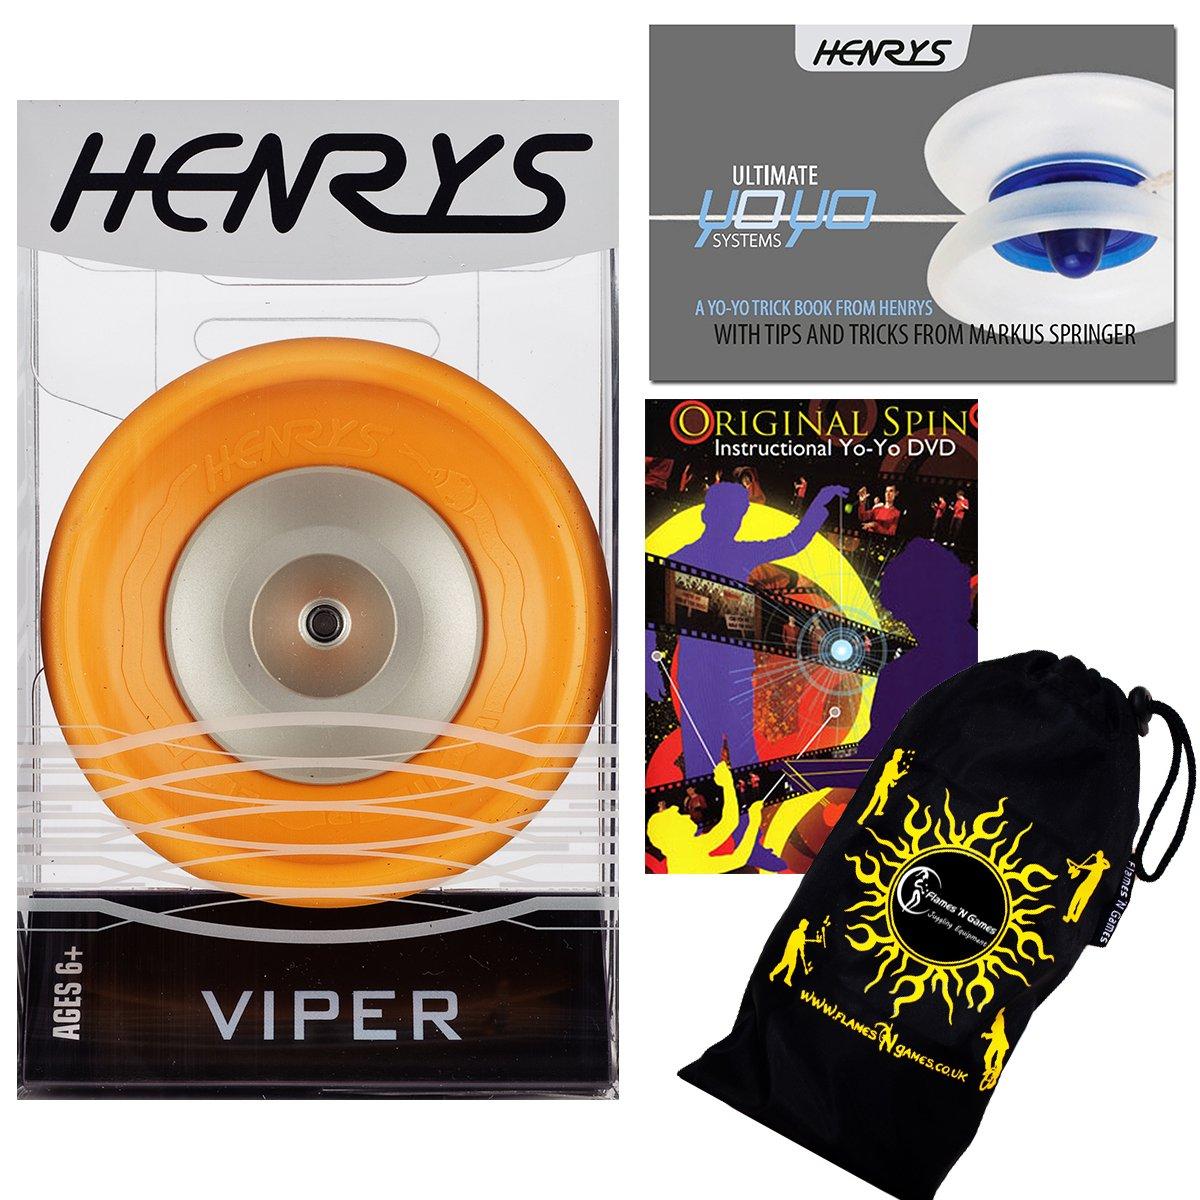 Henrys VIPER YoYo (Orange) Professional Ball Bearing YoYo +Instructional Booklet of Tricks + 75 Yo-Yo Tricks DVD & Travel Bag! Pro YoYos For Kids and Adults!